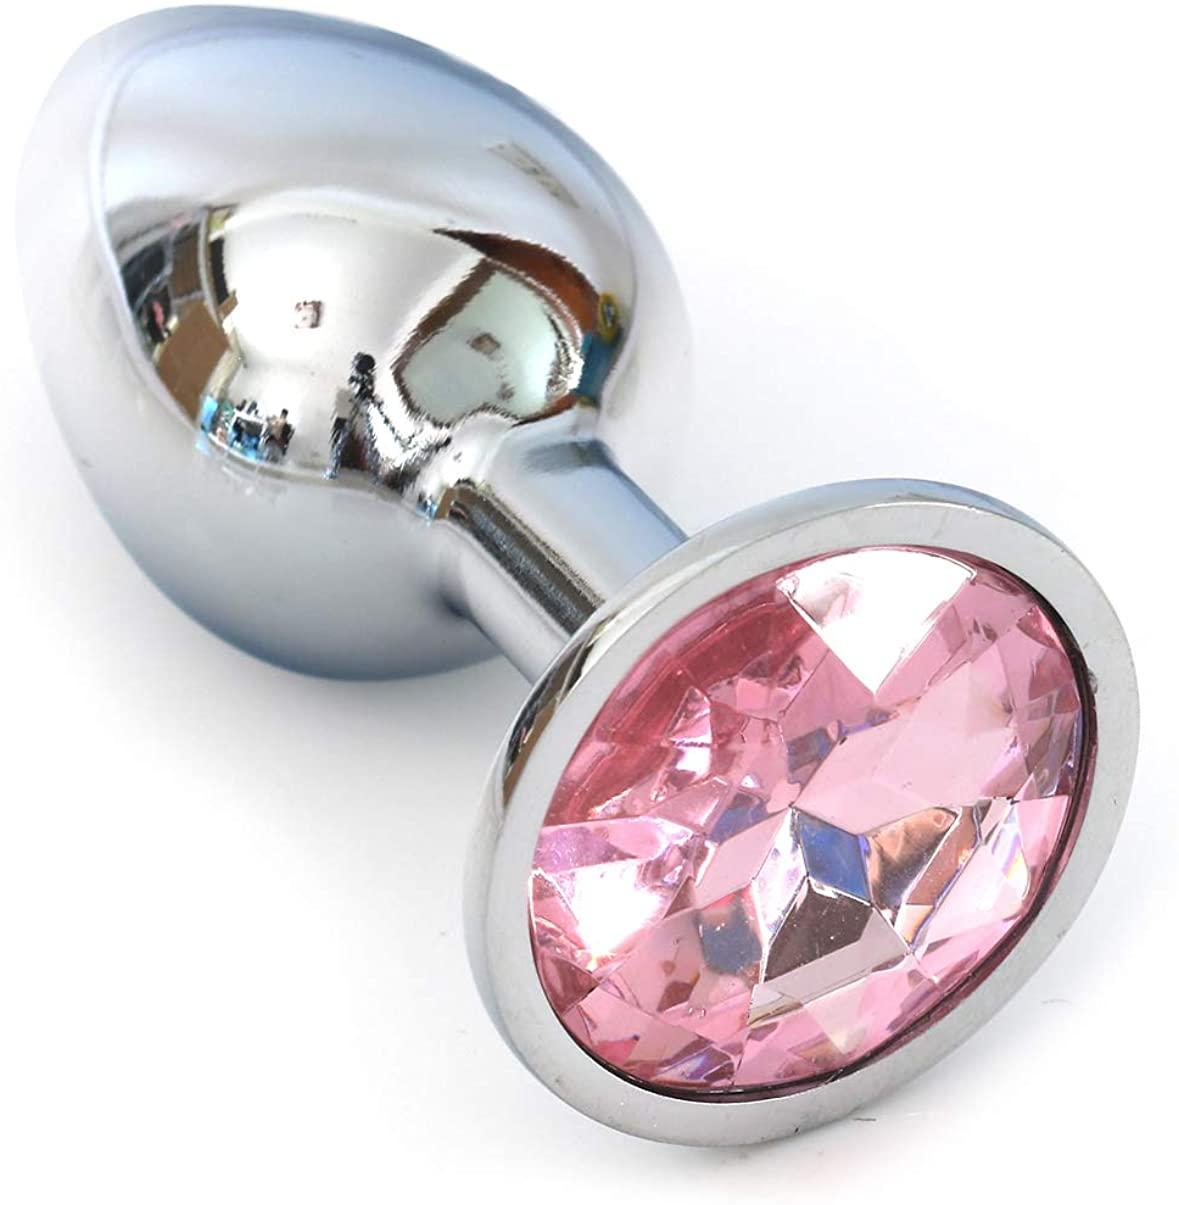 Pink Crystal Stainless Steel Bûtt Pl'ug Beads Jeweled Back